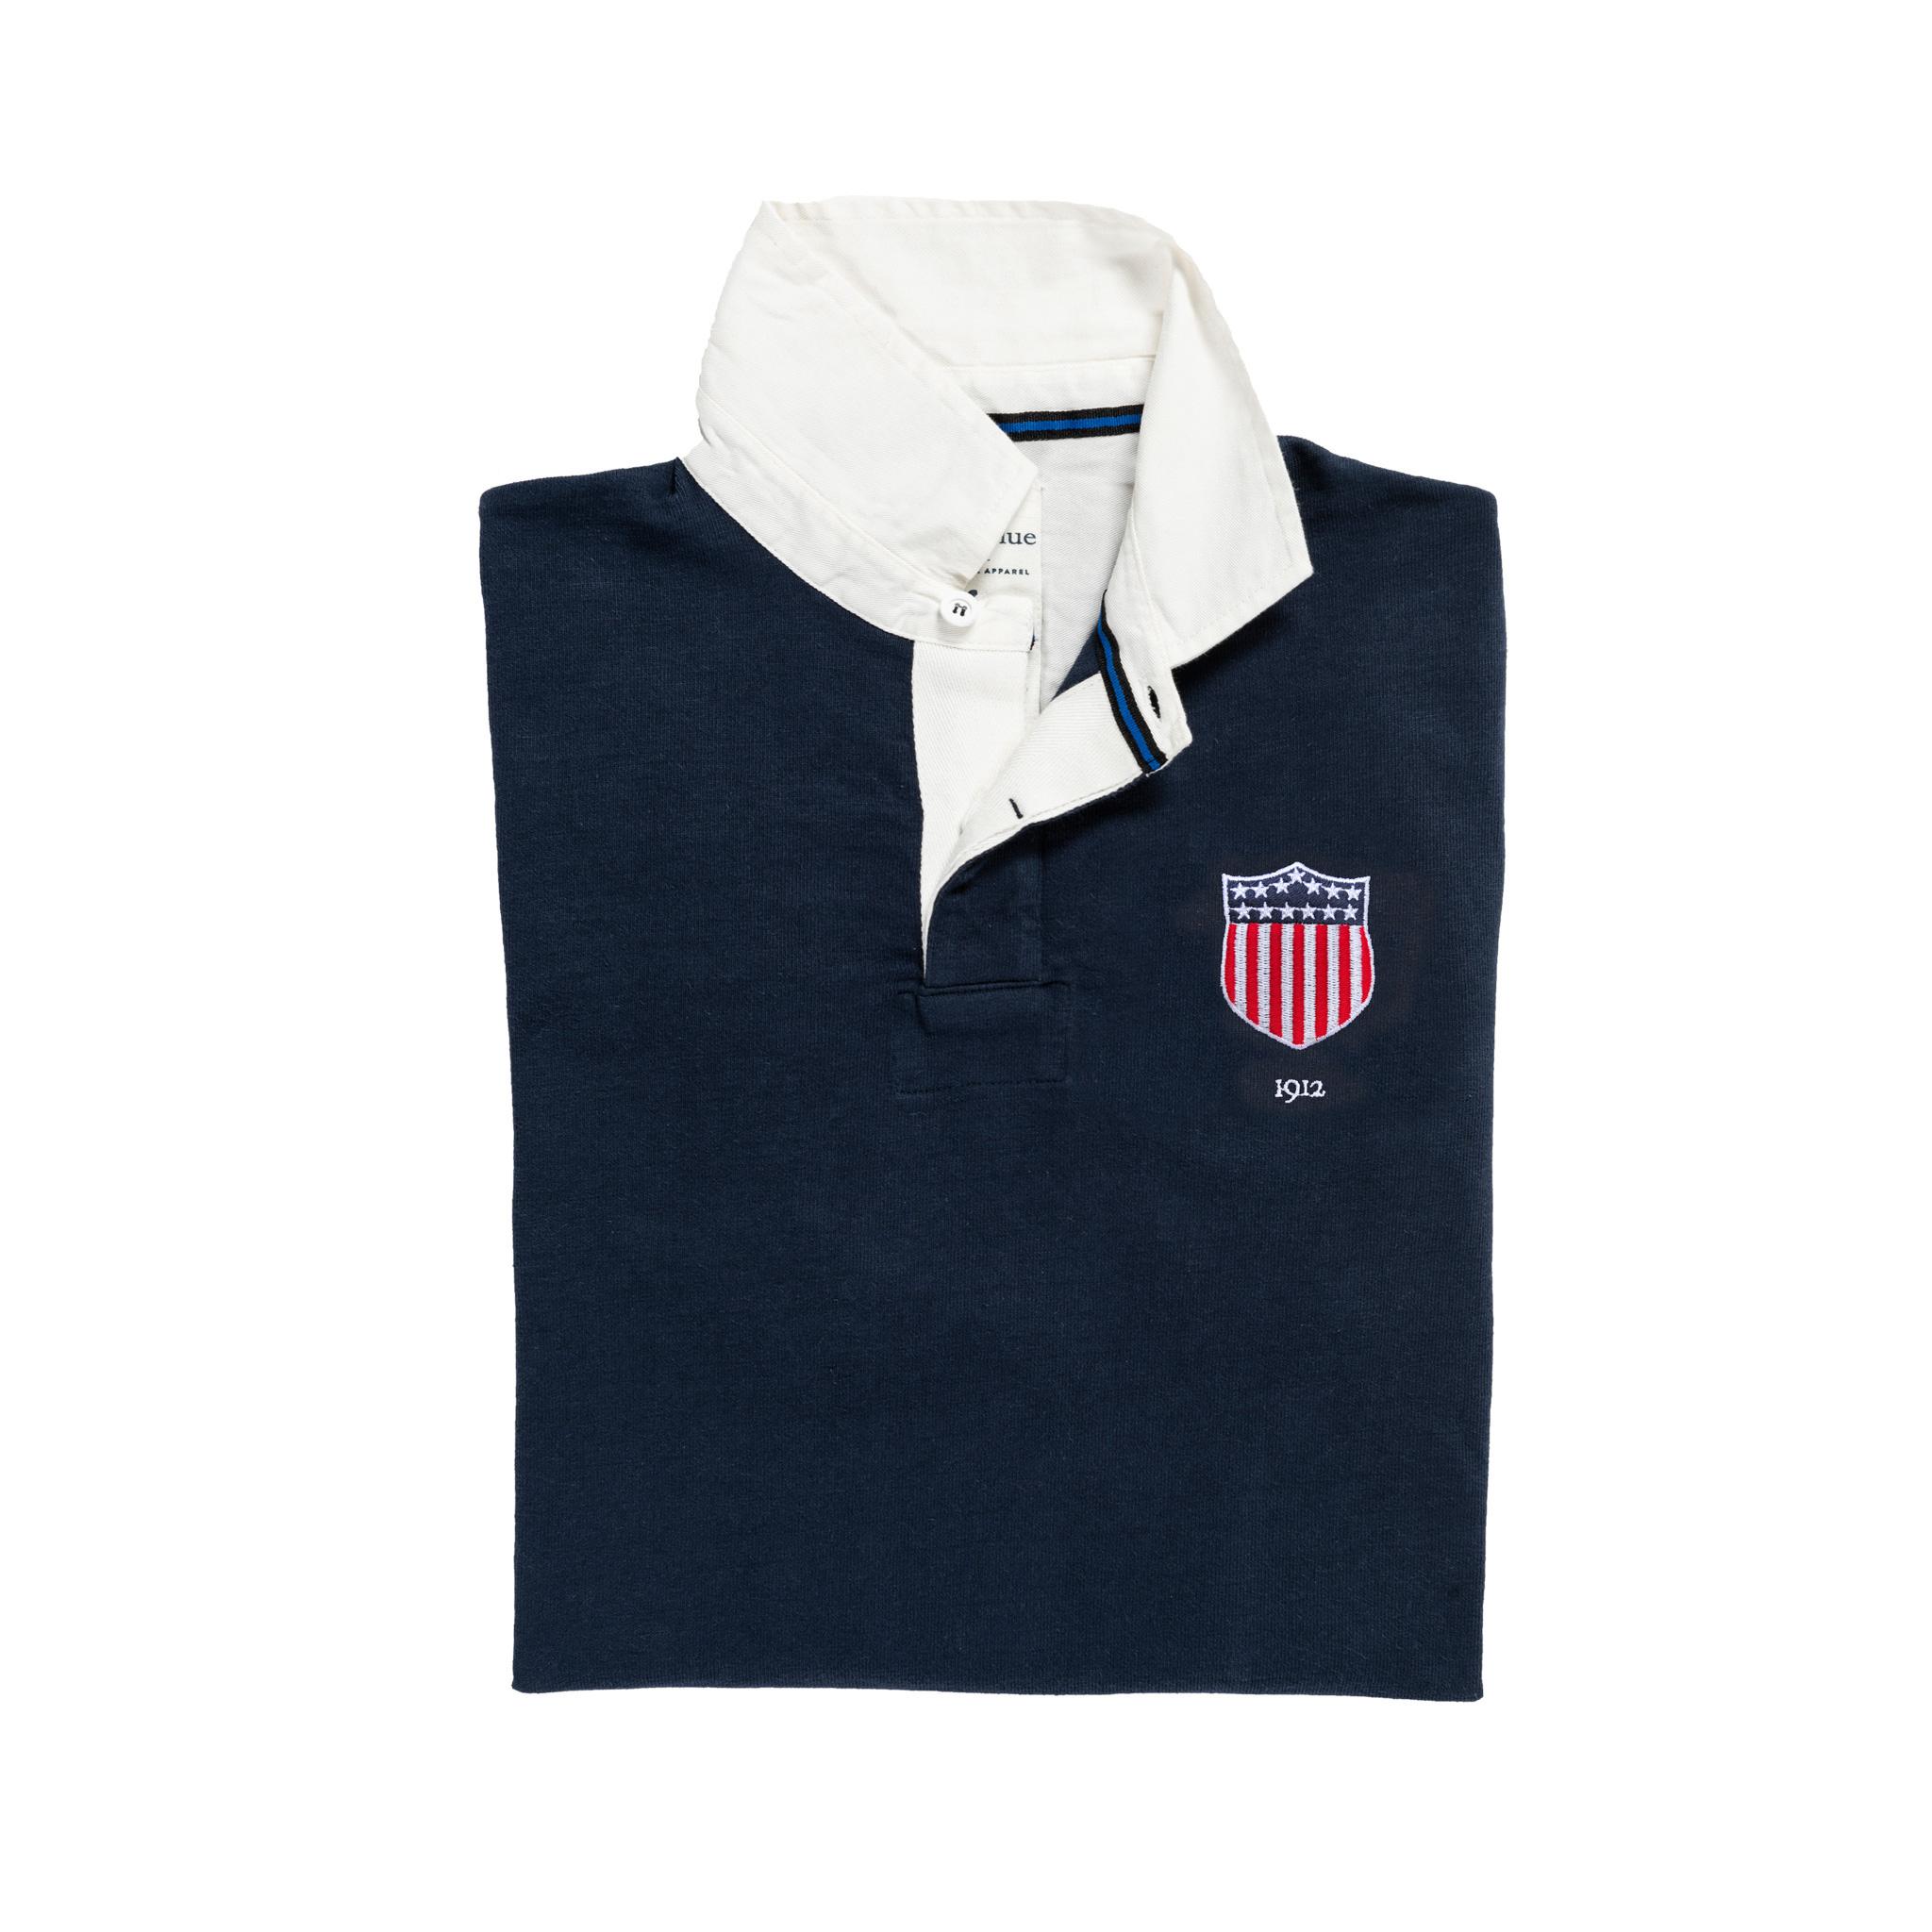 USA 1912 Vintage Rugby Shirt_Away